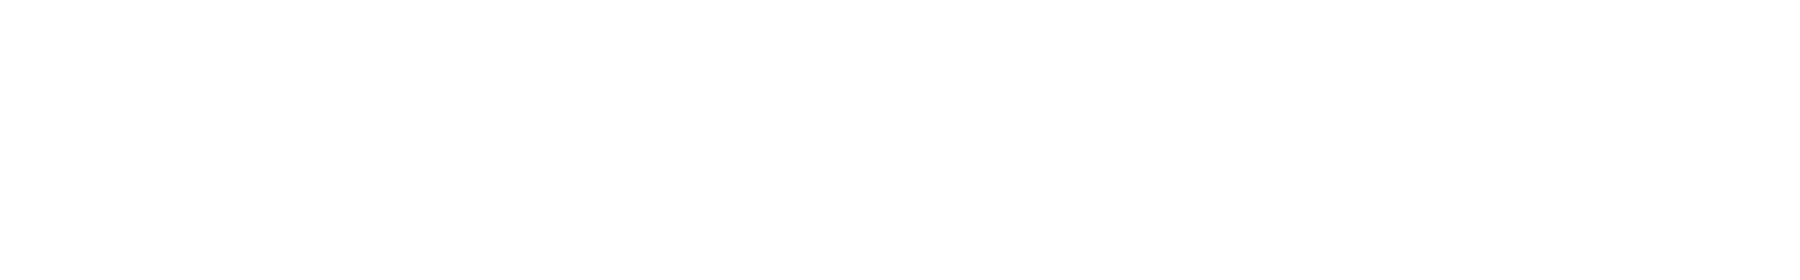 atmos 13